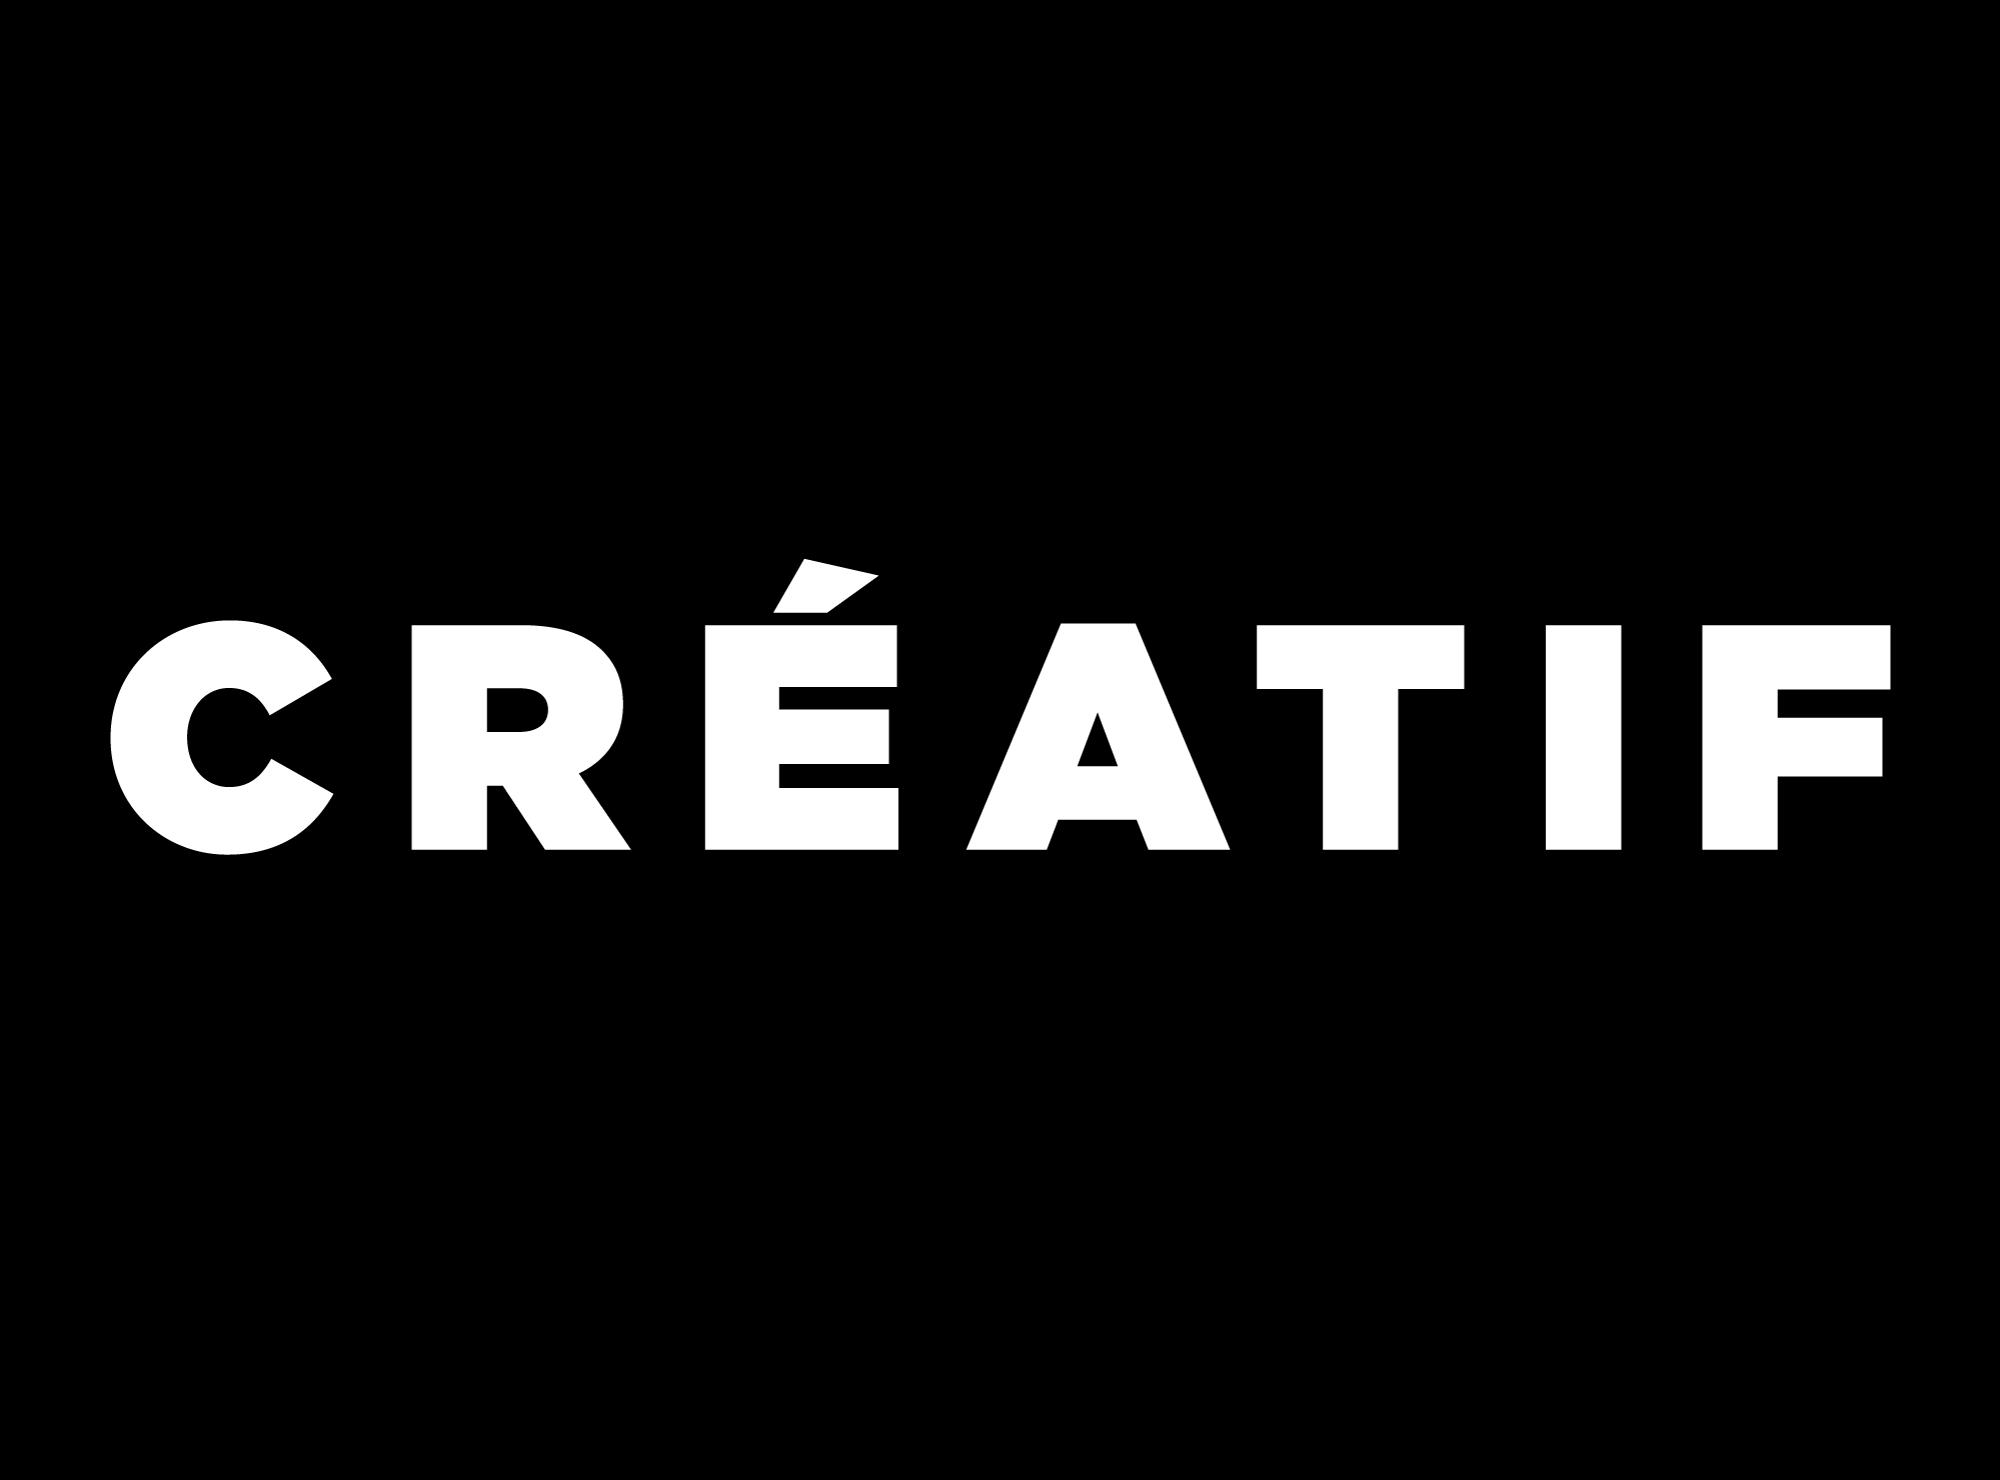 CREATIF-STEPANDREPEAT-A.png